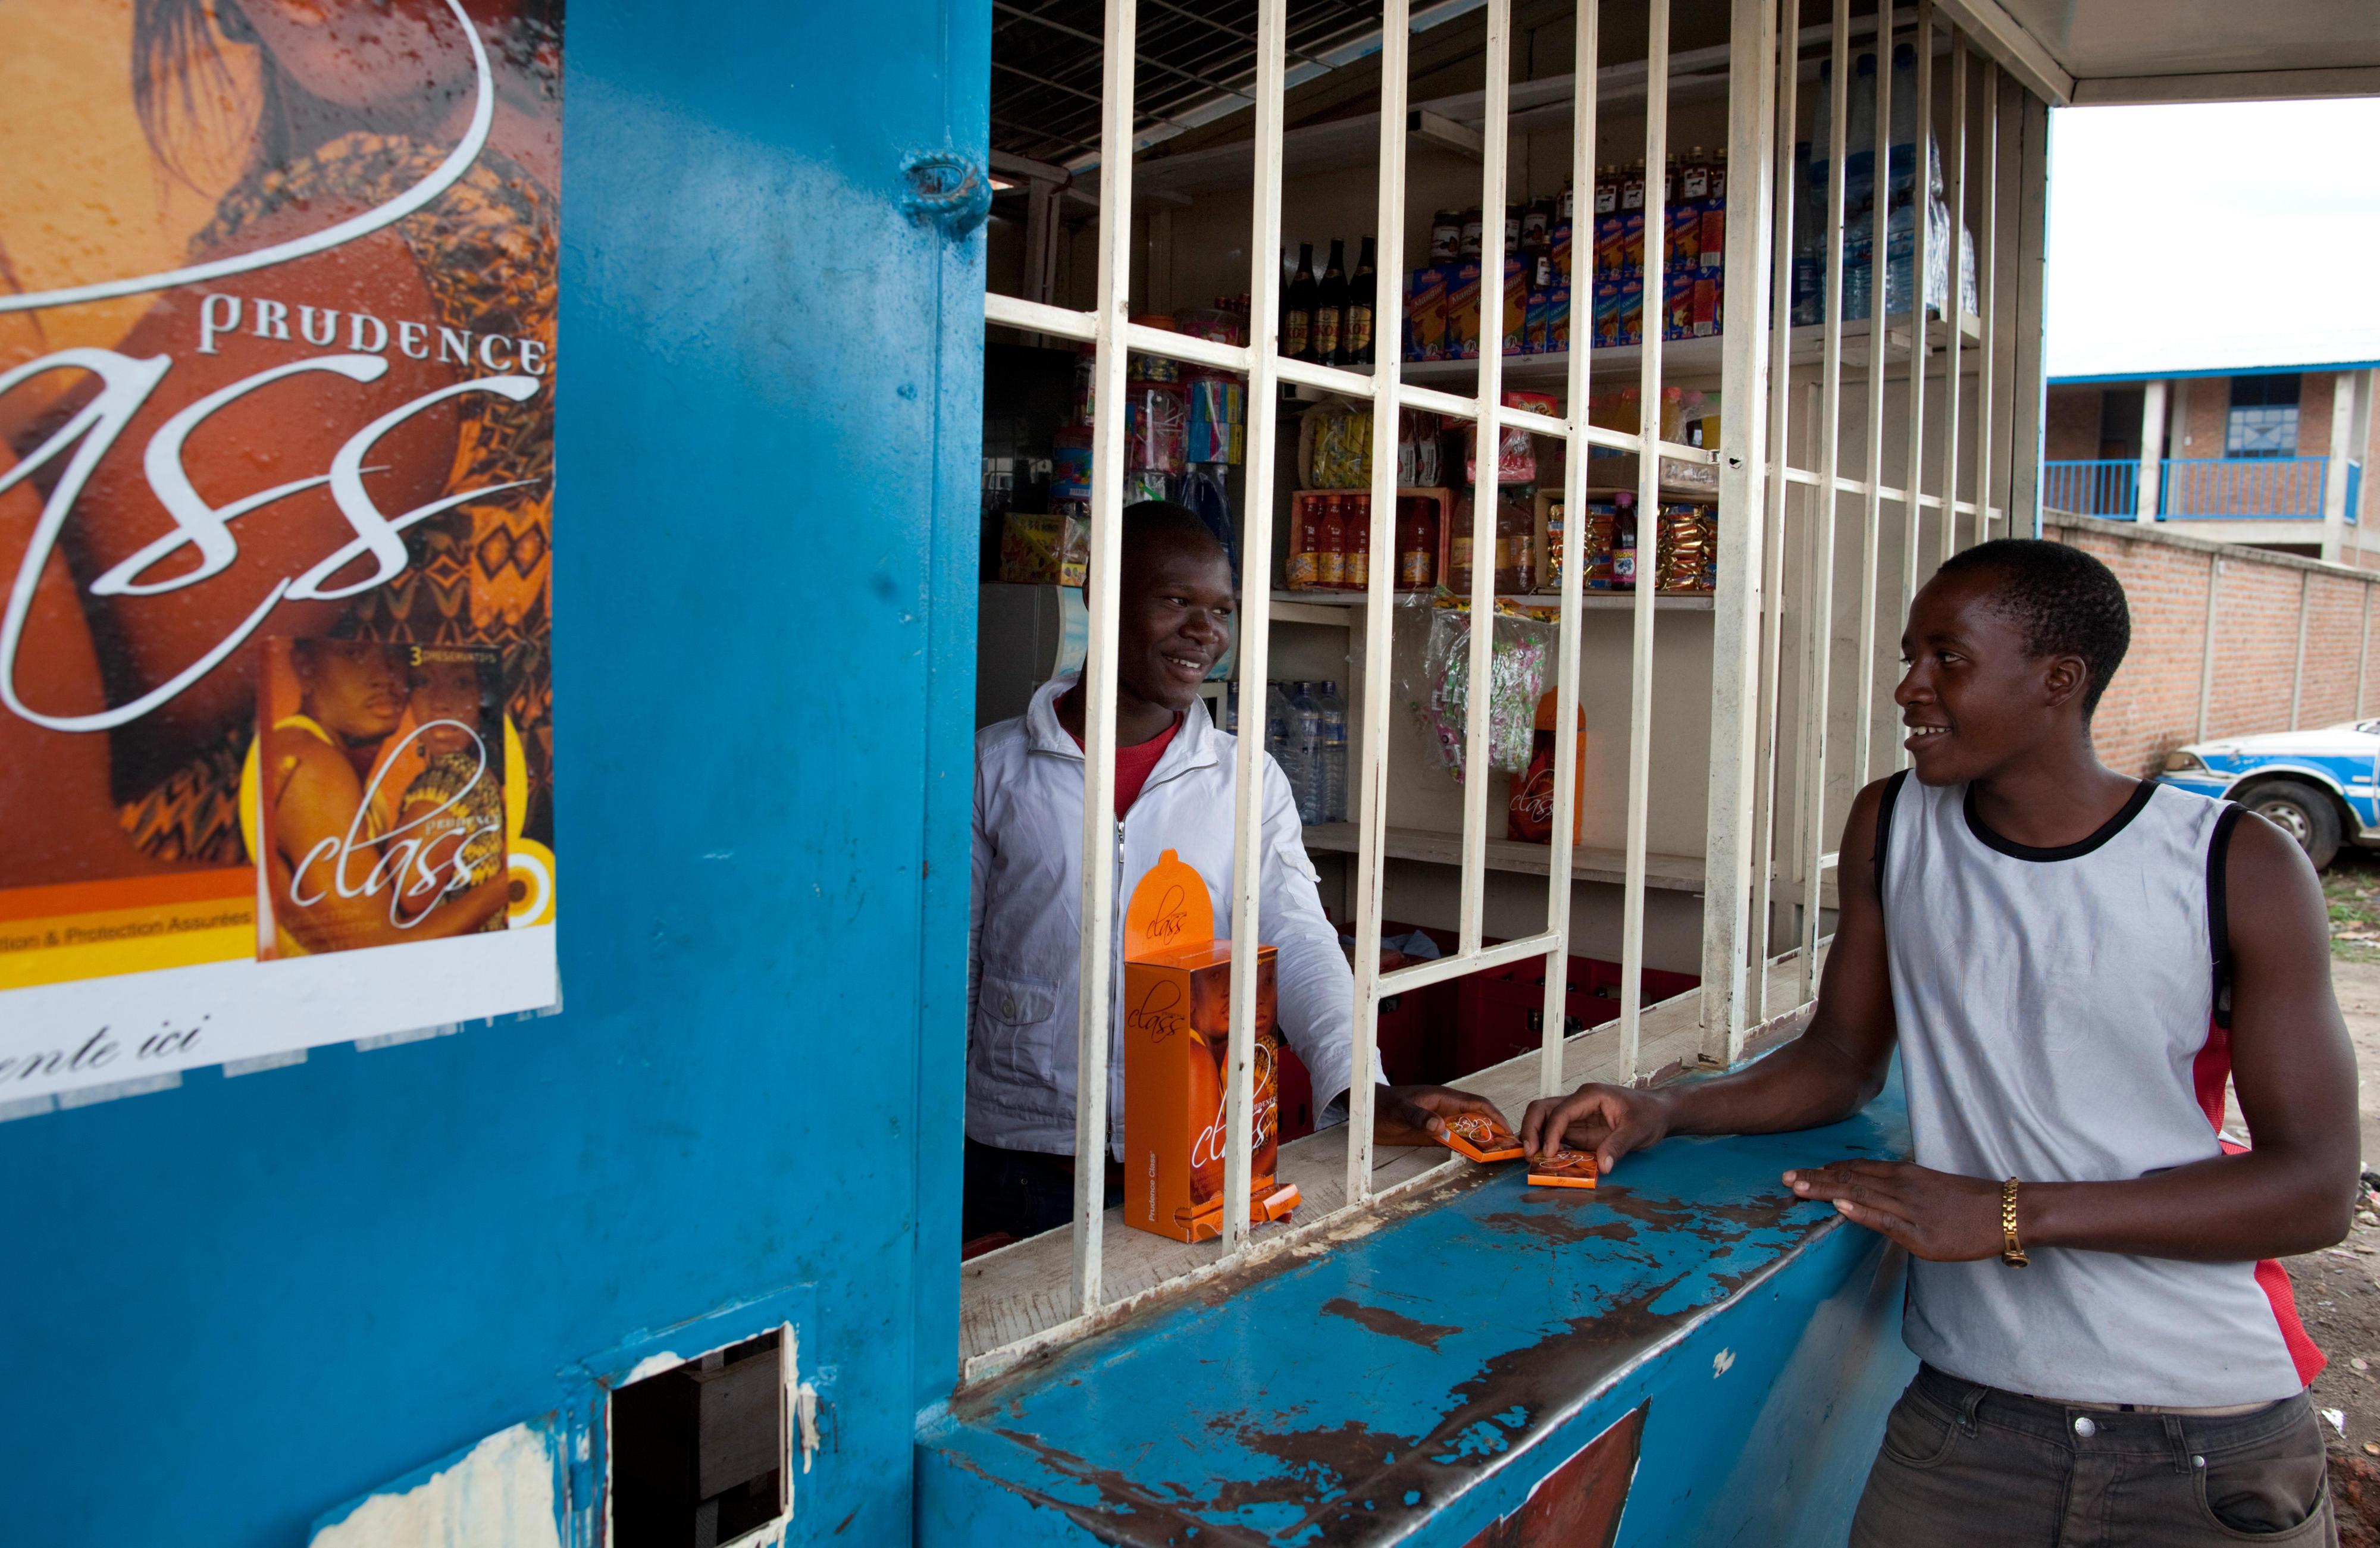 Verkauf von Kondomen an einem Kiosk in Bujumbura, Burundi